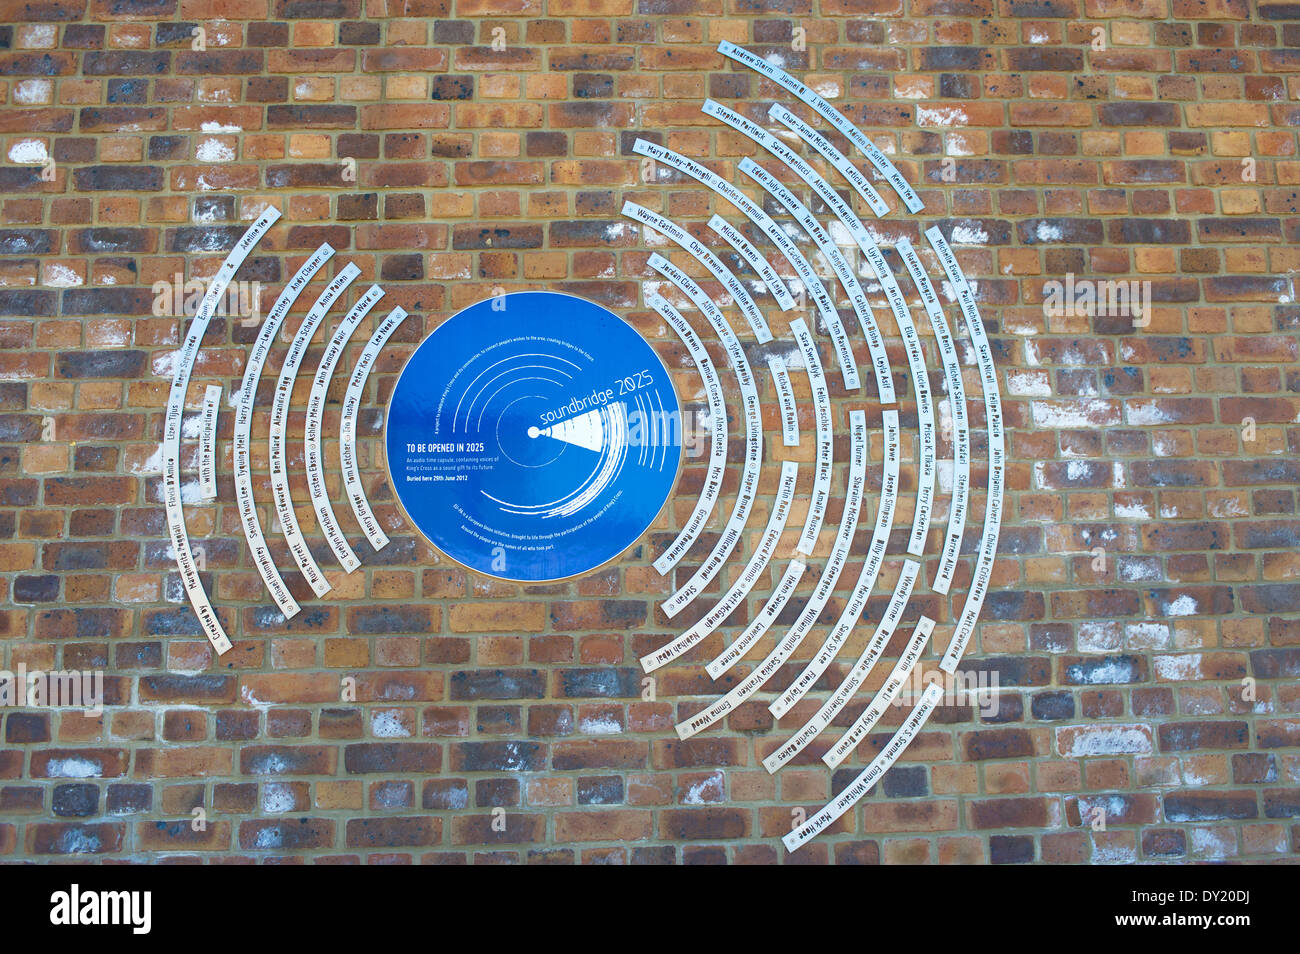 Audio time capsule sign, Regents Canal, Camden, London, England, UK. Stock Photo